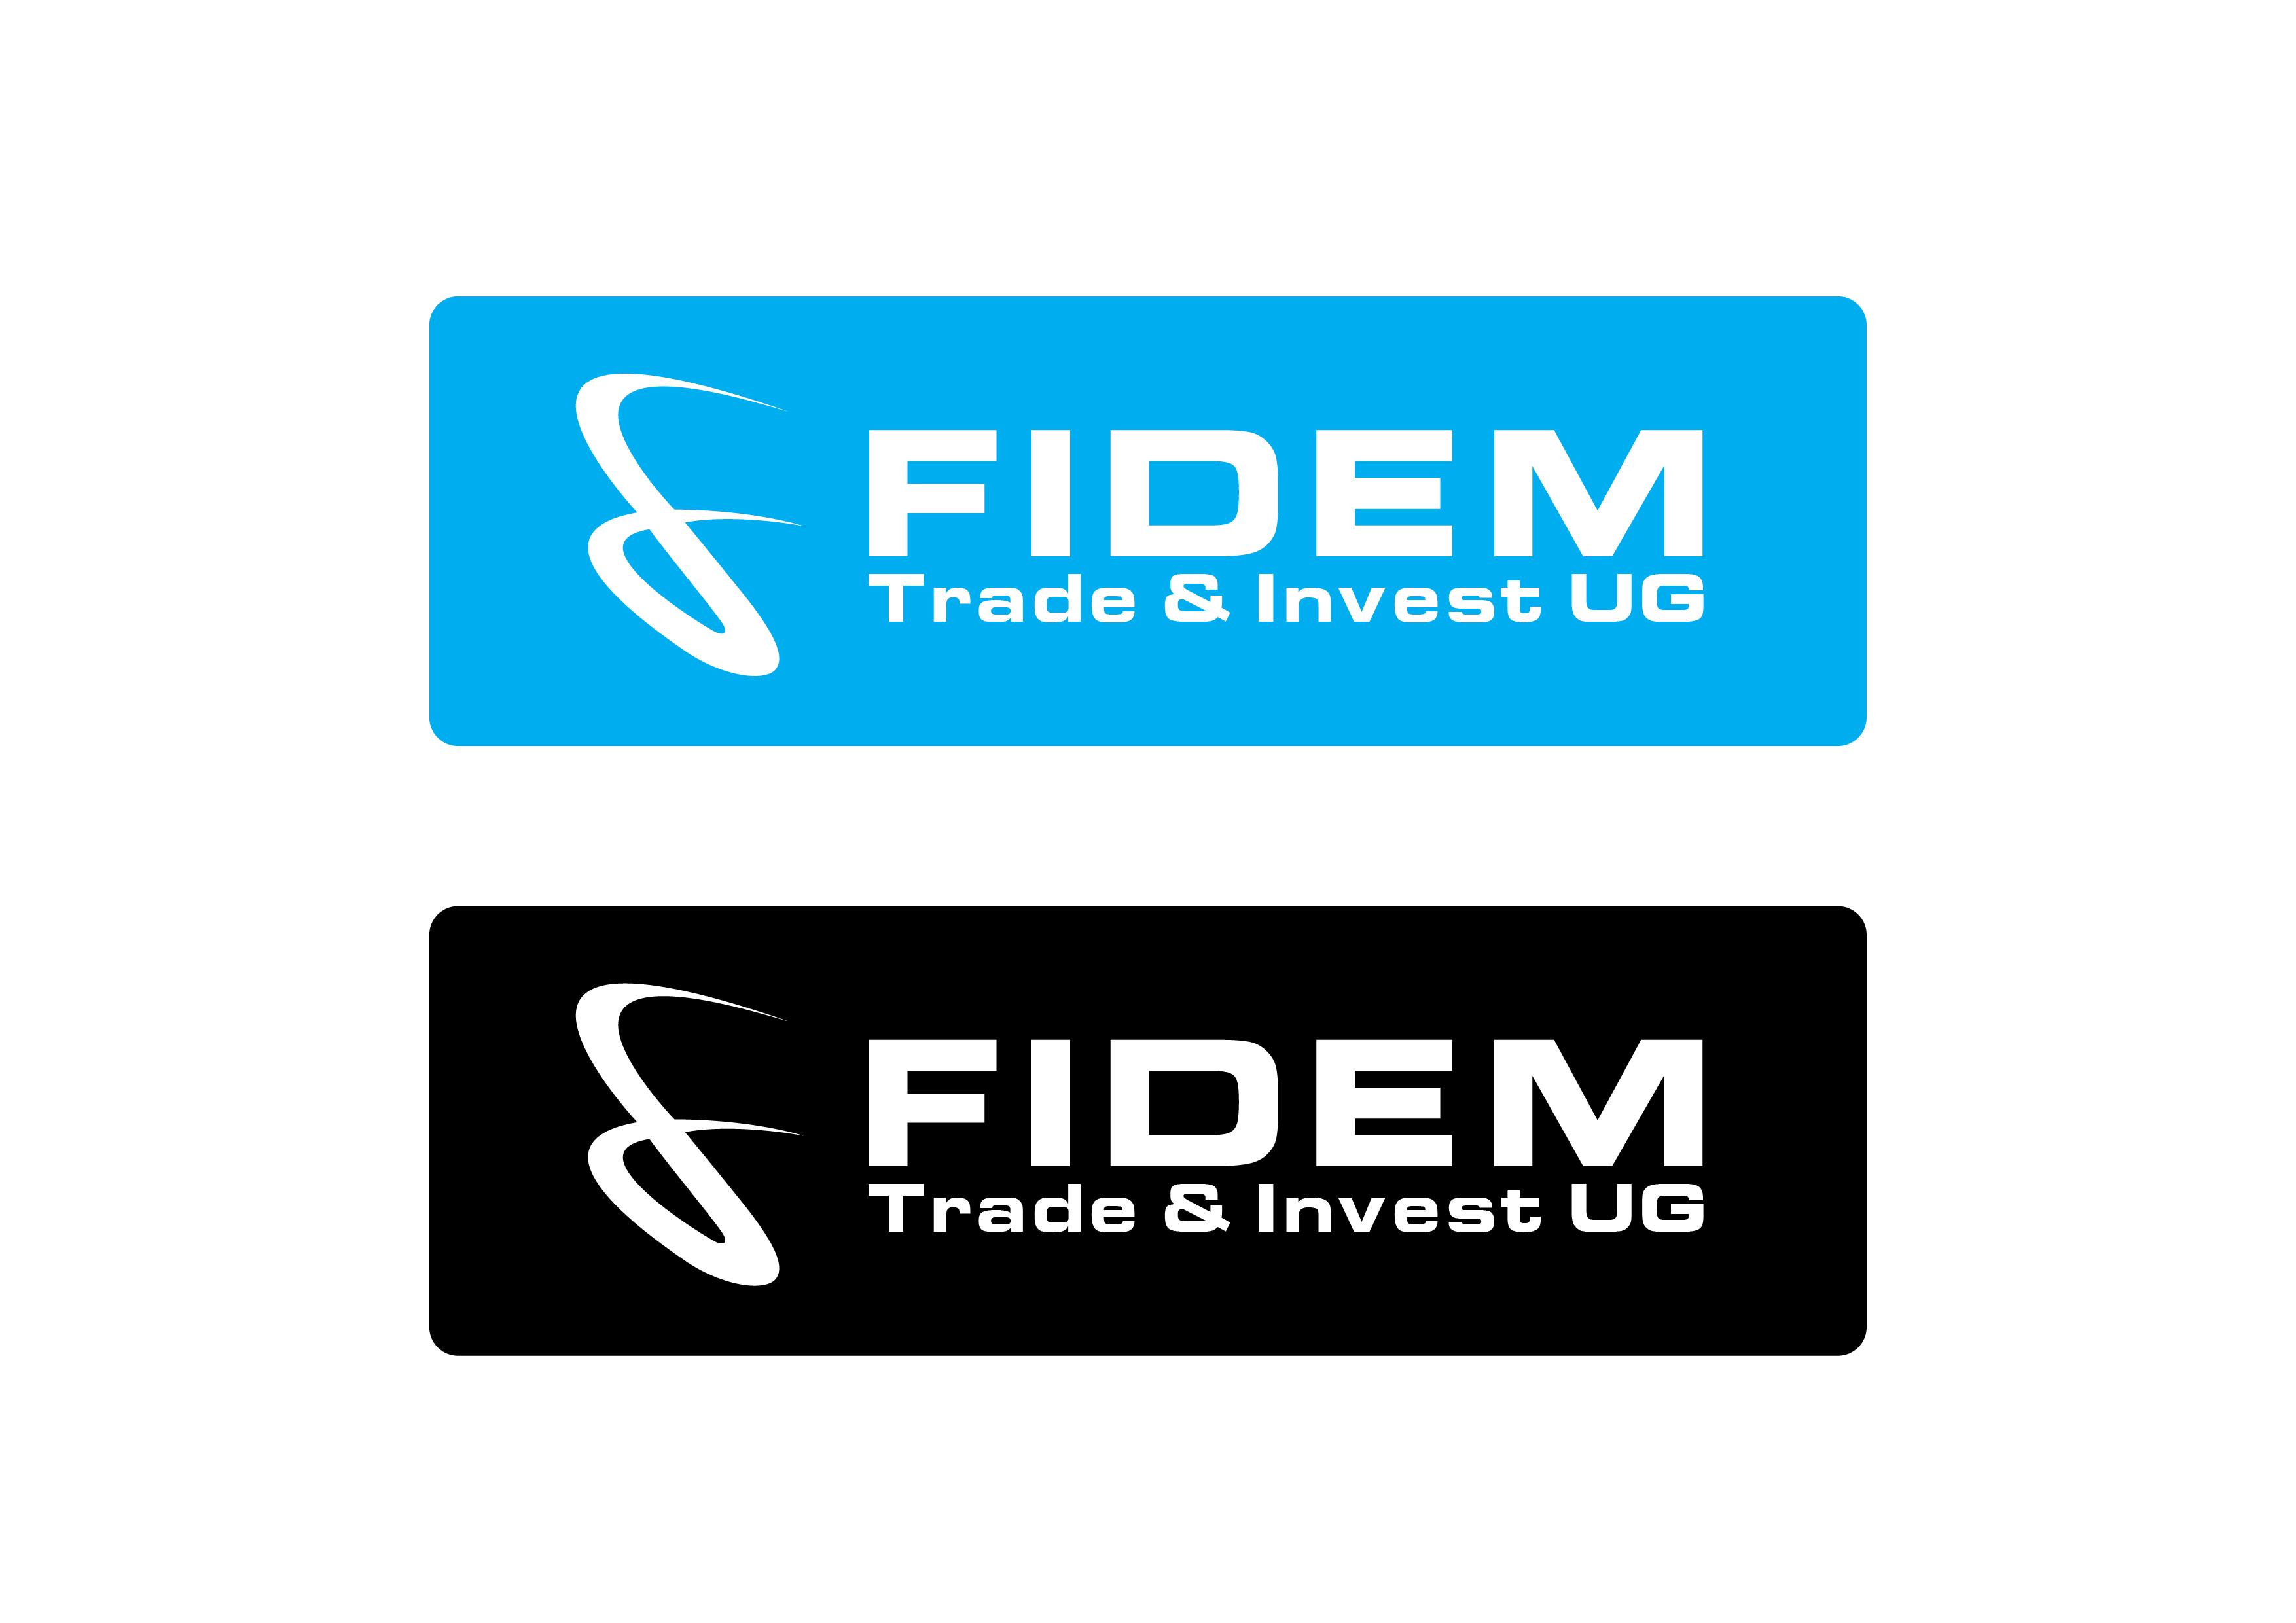 Logo Design by 3draw - Entry No. 763 in the Logo Design Contest Professional Logo Design for FIDEM Trade & Invest UG.